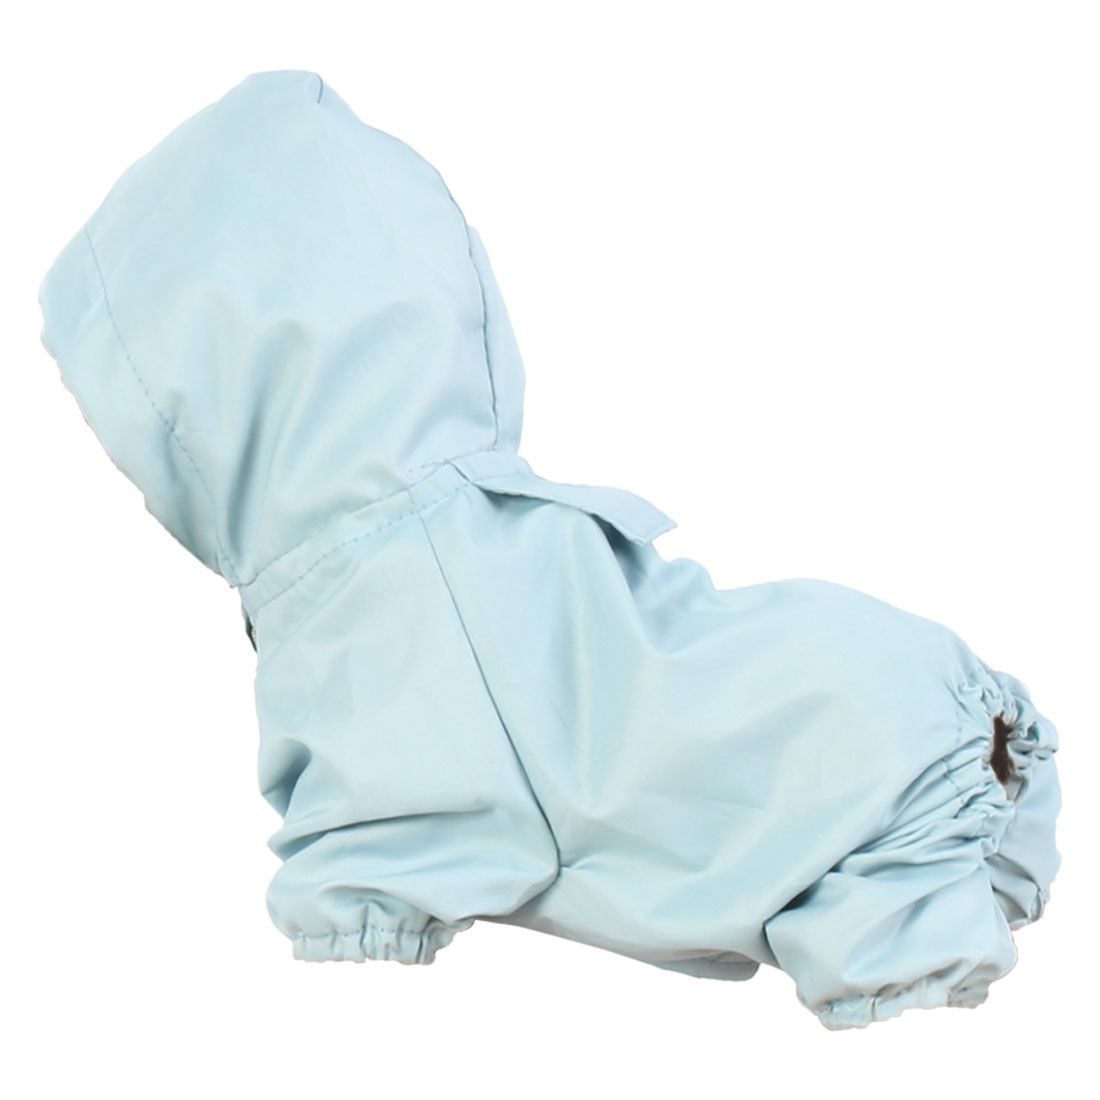 Pet Dog Raincoat Rain Jacket Polyester Water-resistant Rainwear Blue XL